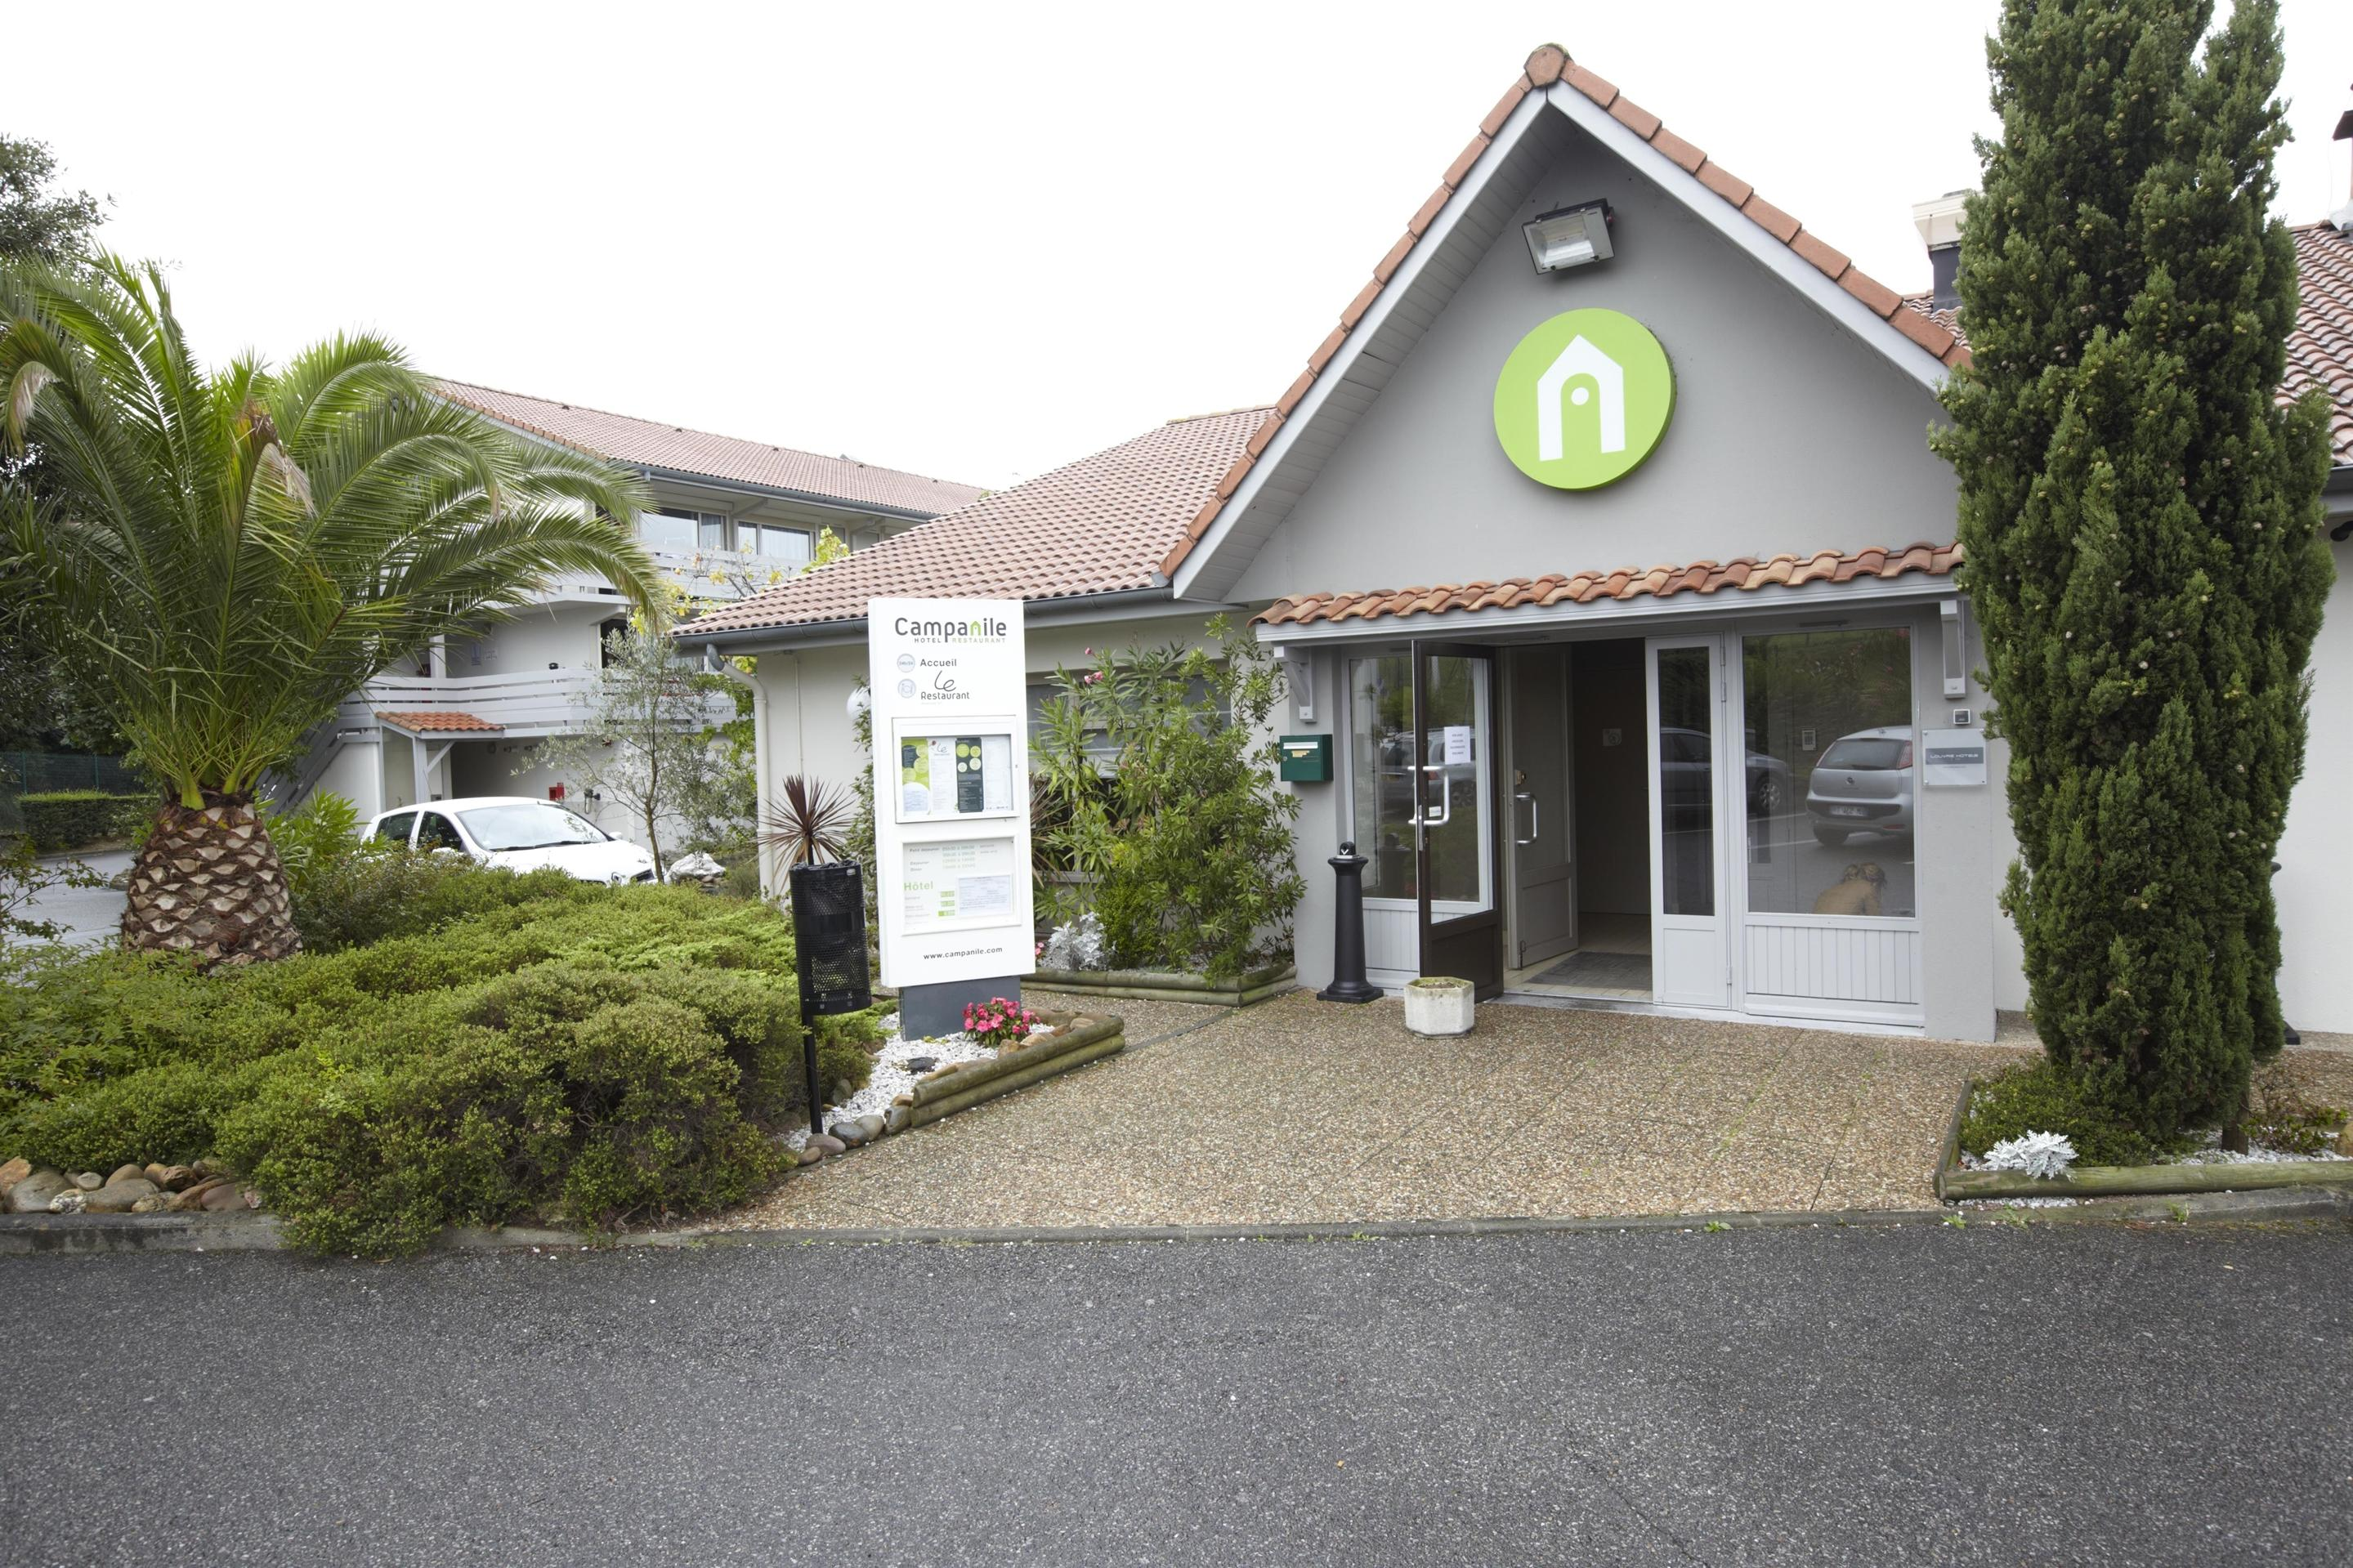 Hoteles en Ezpeleta Buscar en KAYAK